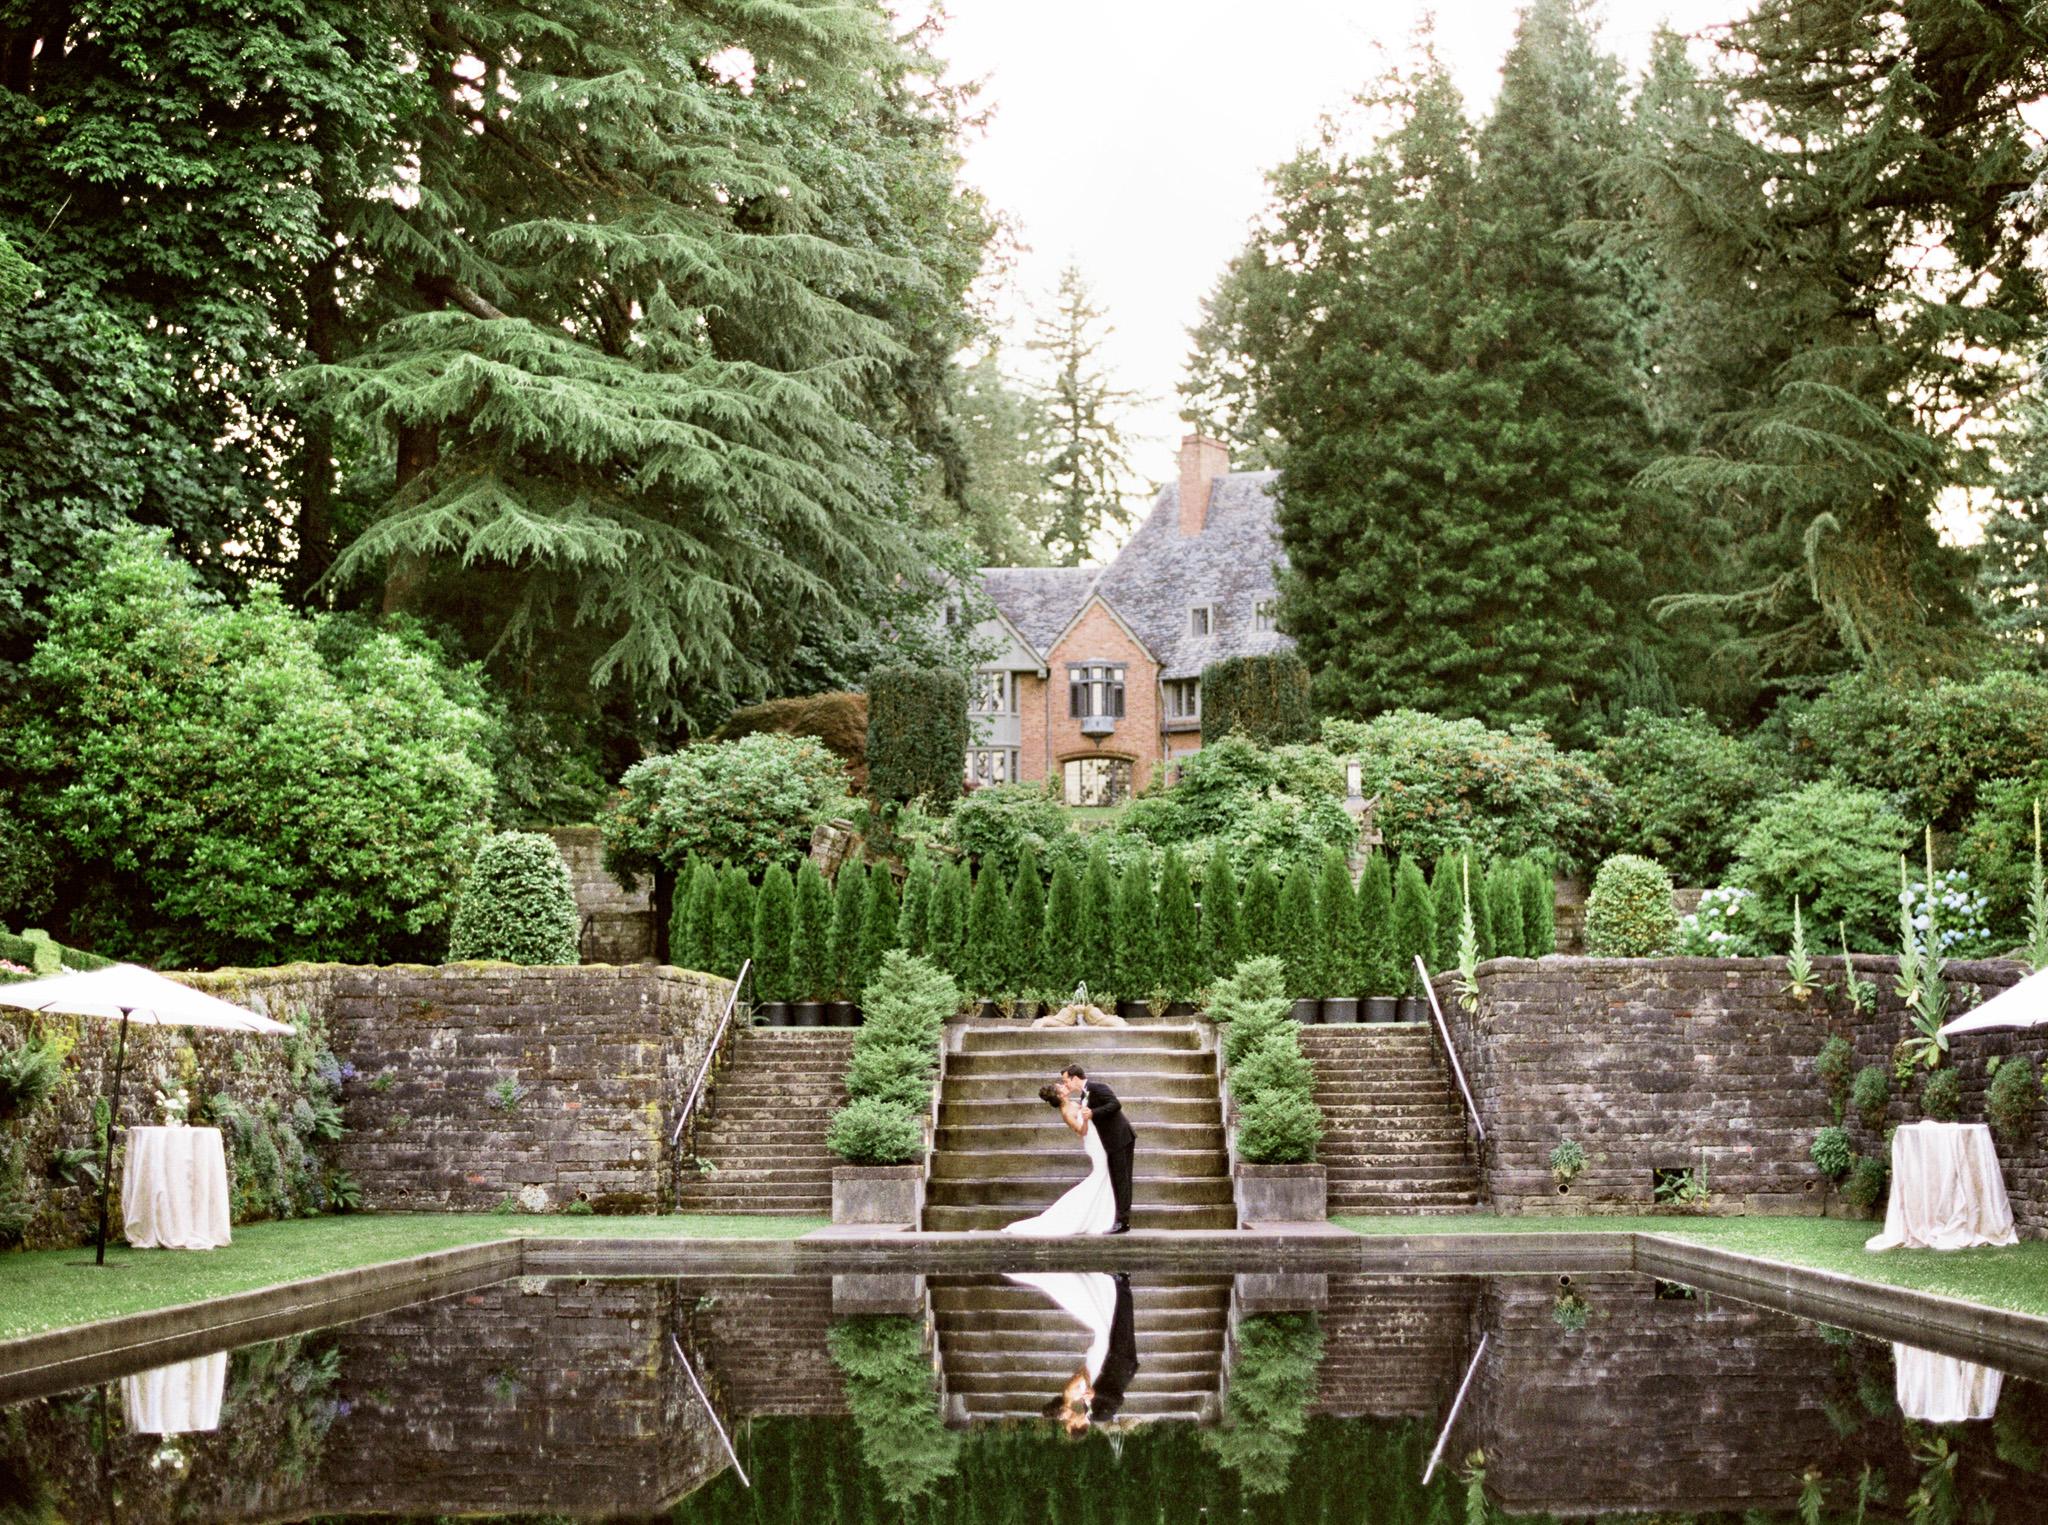 087OutliveCreative_Travel_Photographer_Videographer_Lewis&Clark_Oregon_Elegant_BlackTie_Destination_Wedding.jpg